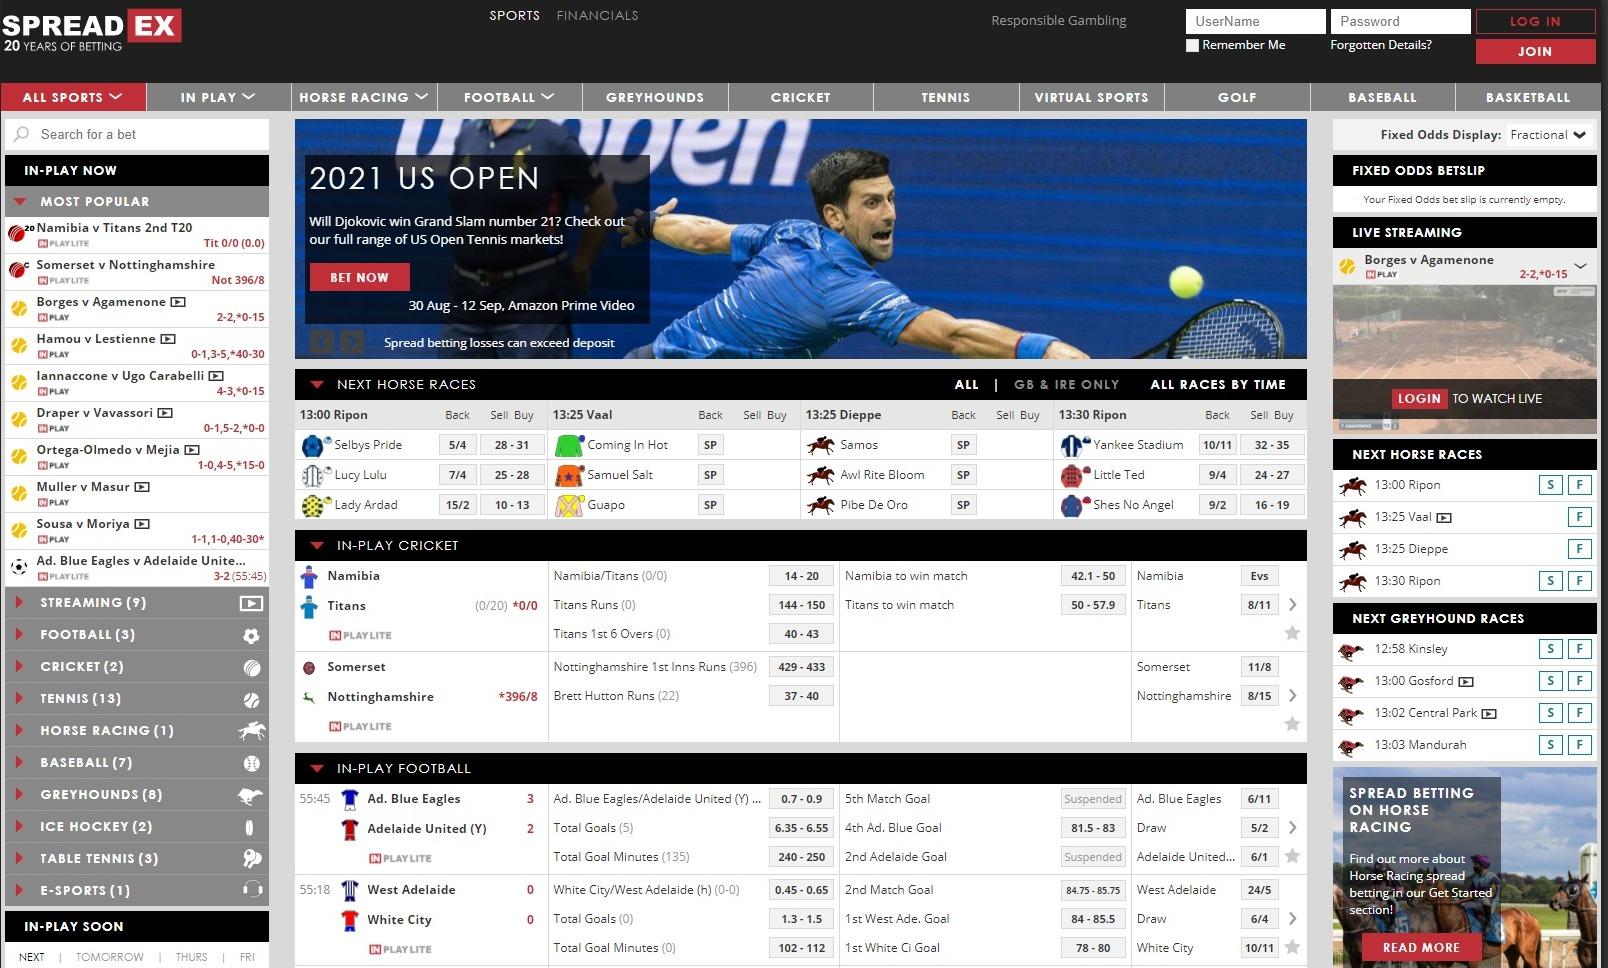 Spreadex Sports Review